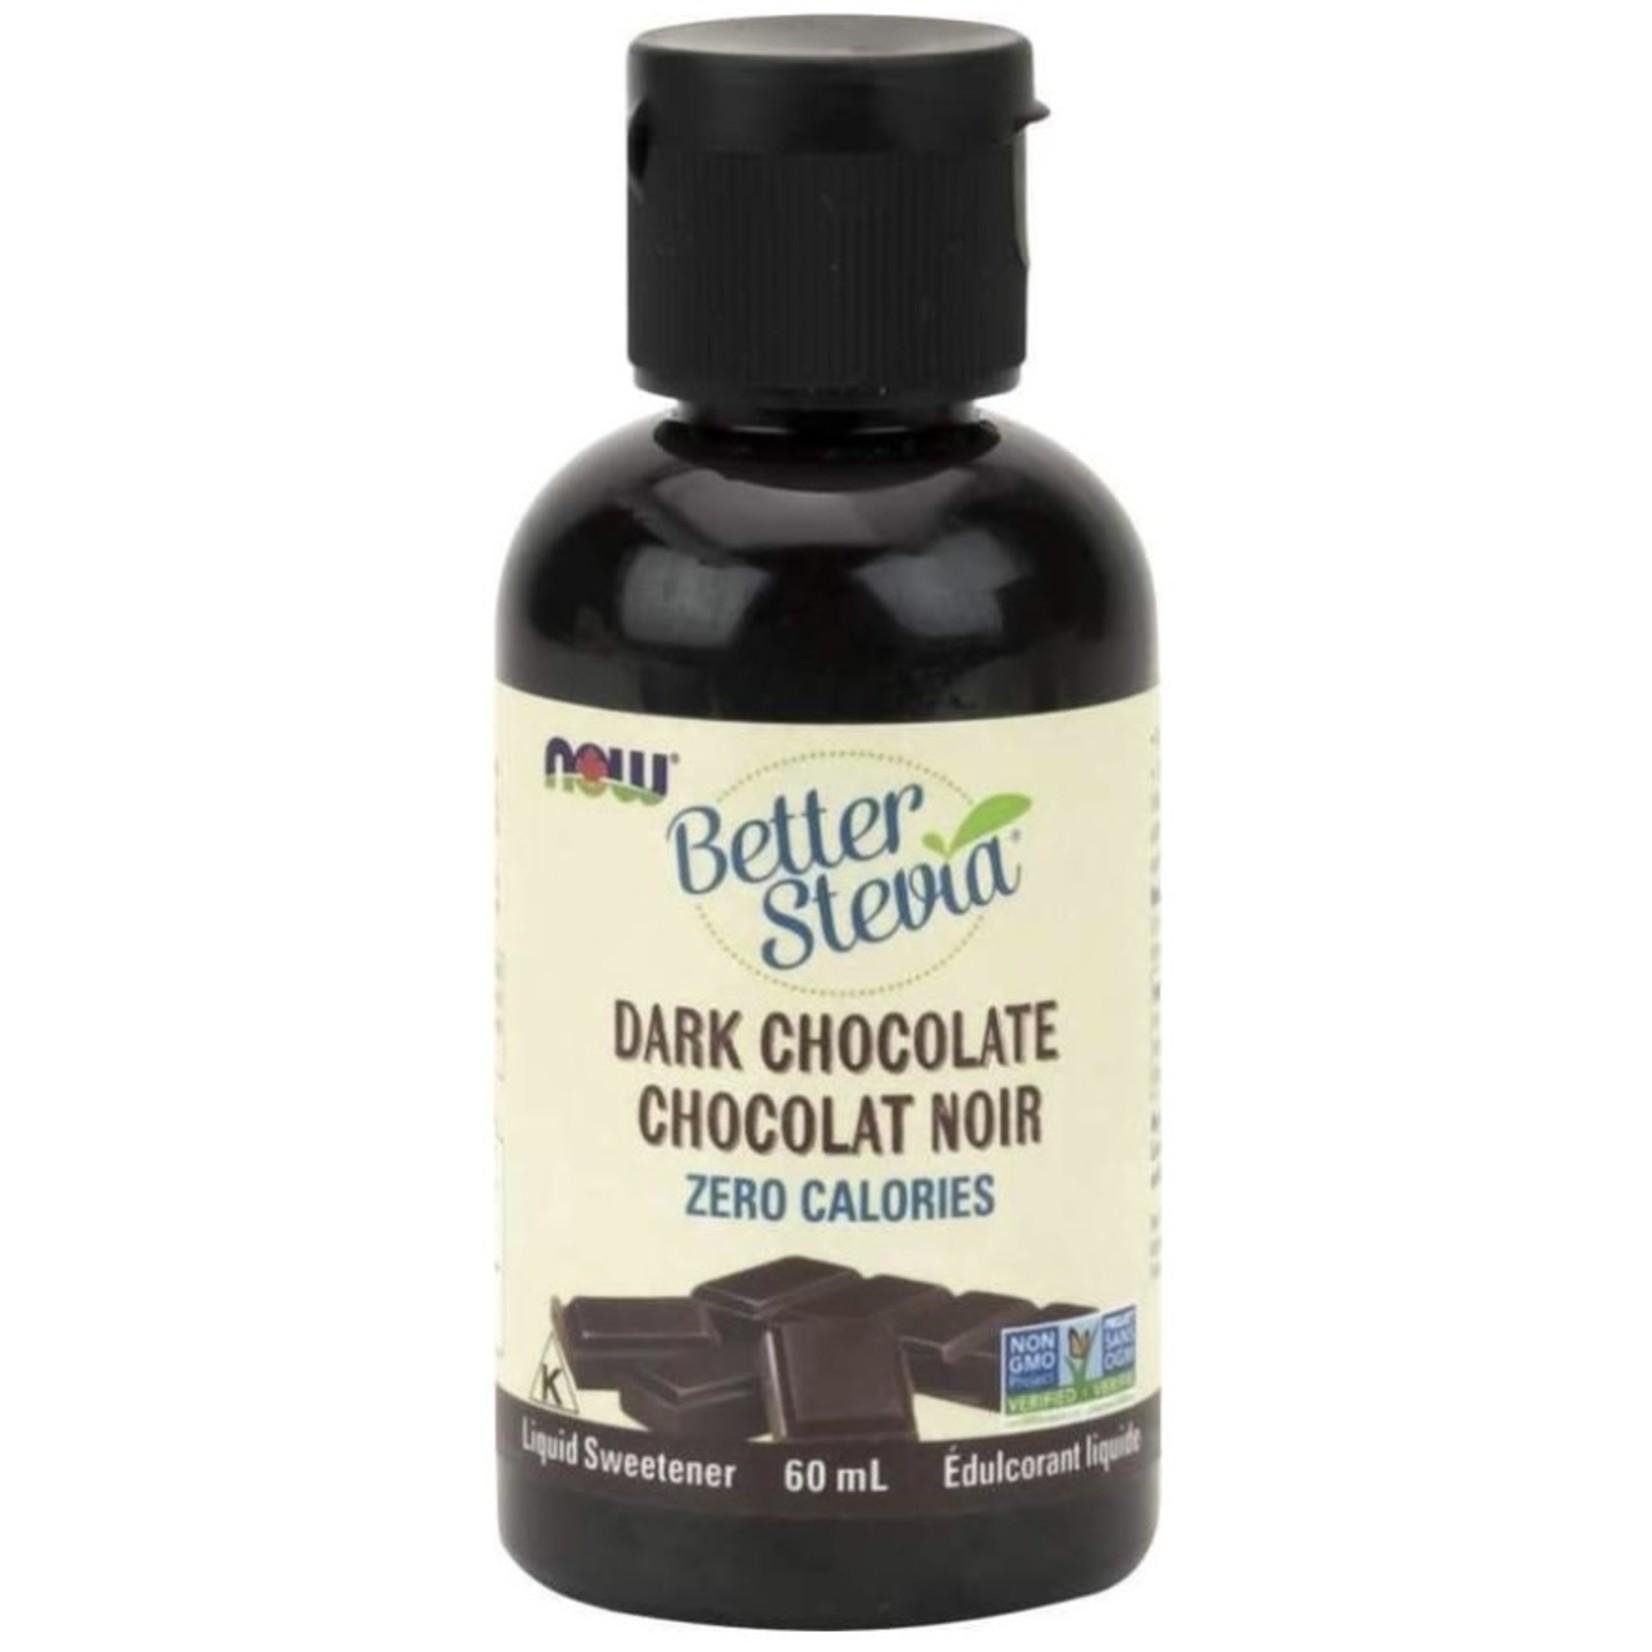 Now Now Better Stevia Dark Chocolate 60ml